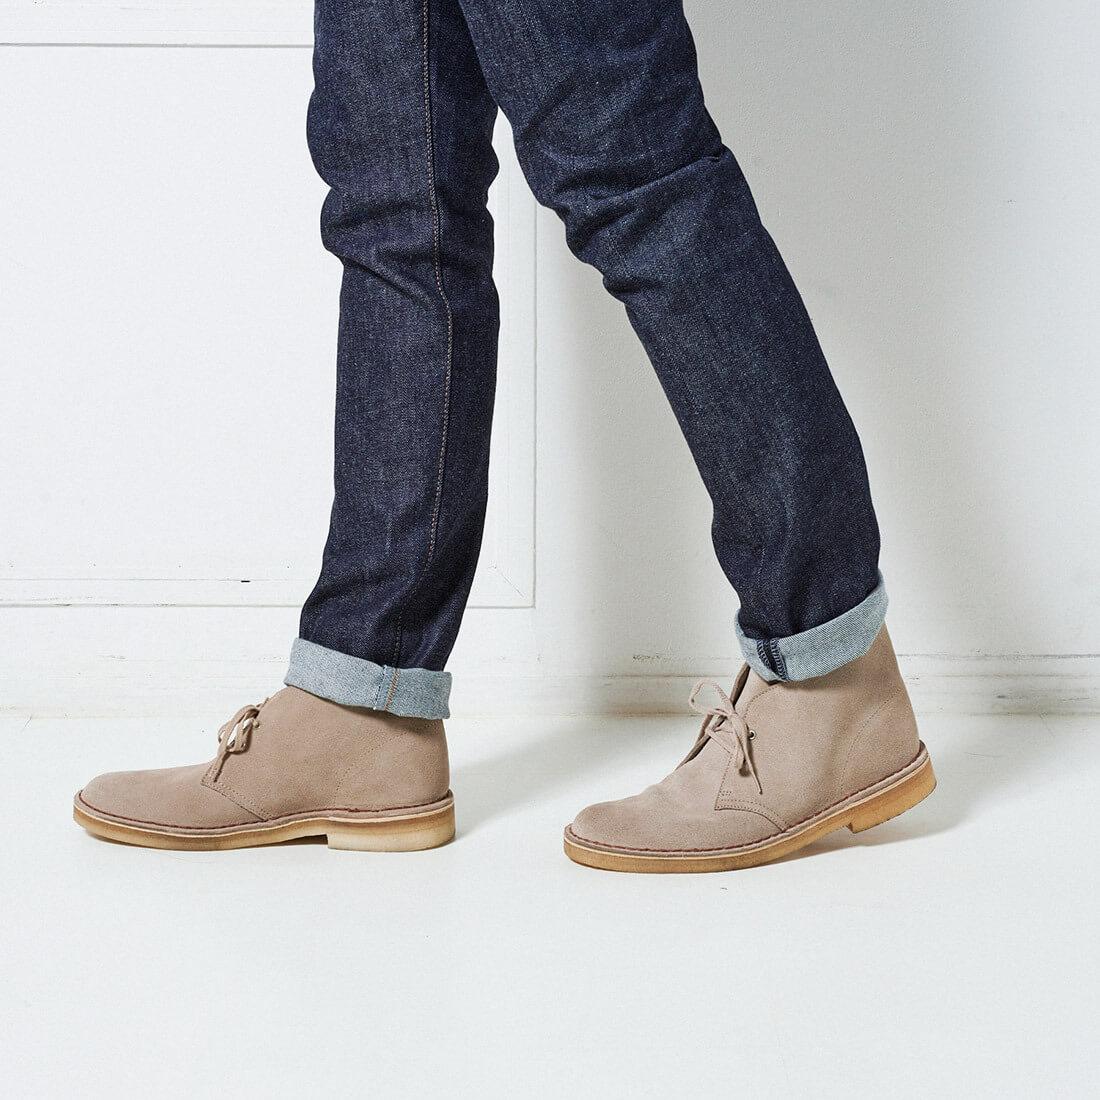 jeans-clarks